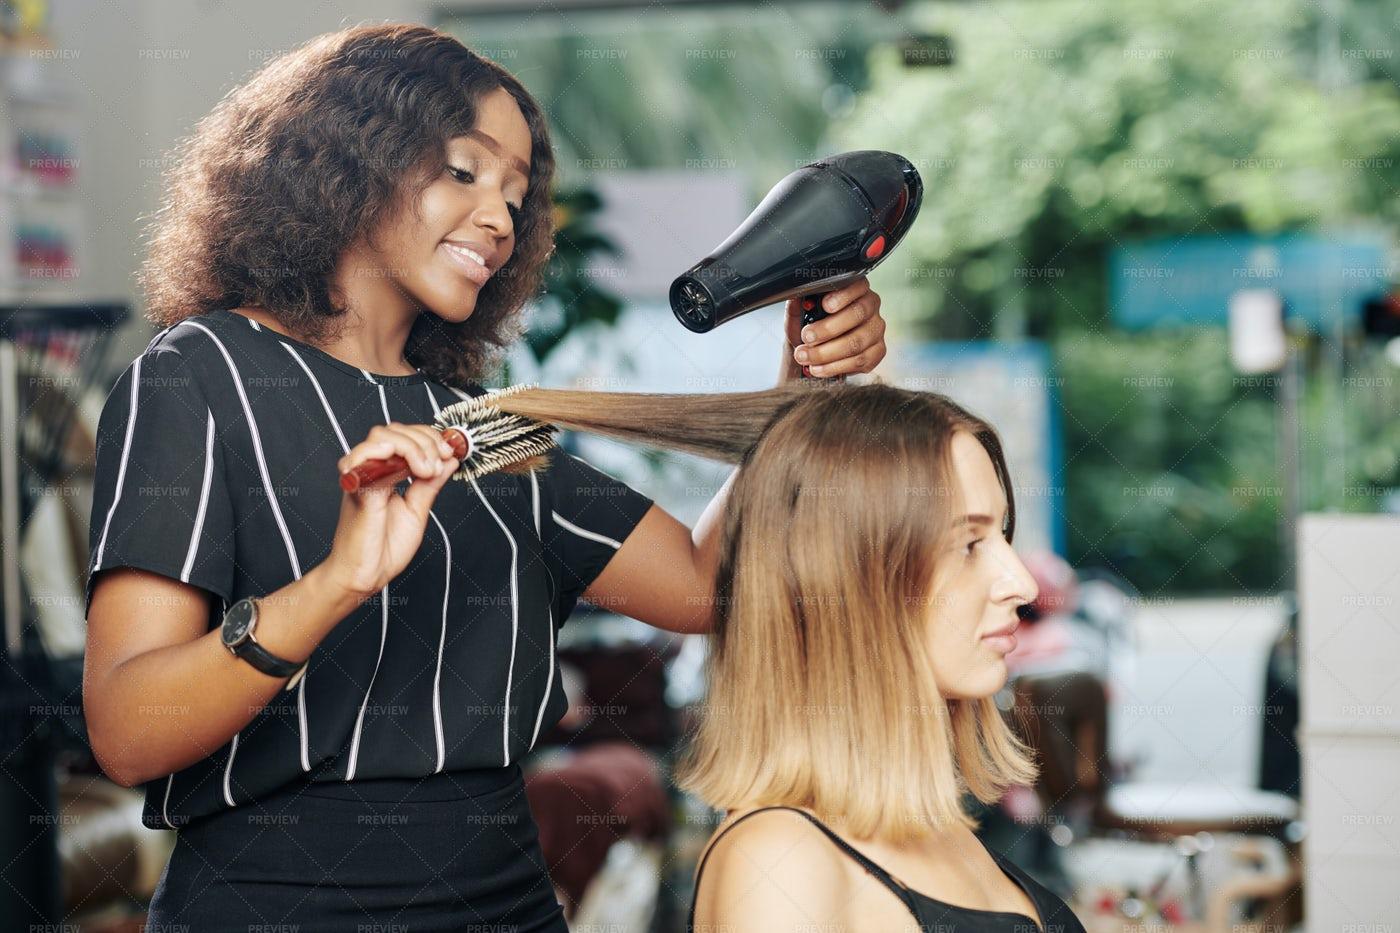 Hairdresser Working In Beauty Salon: Stock Photos